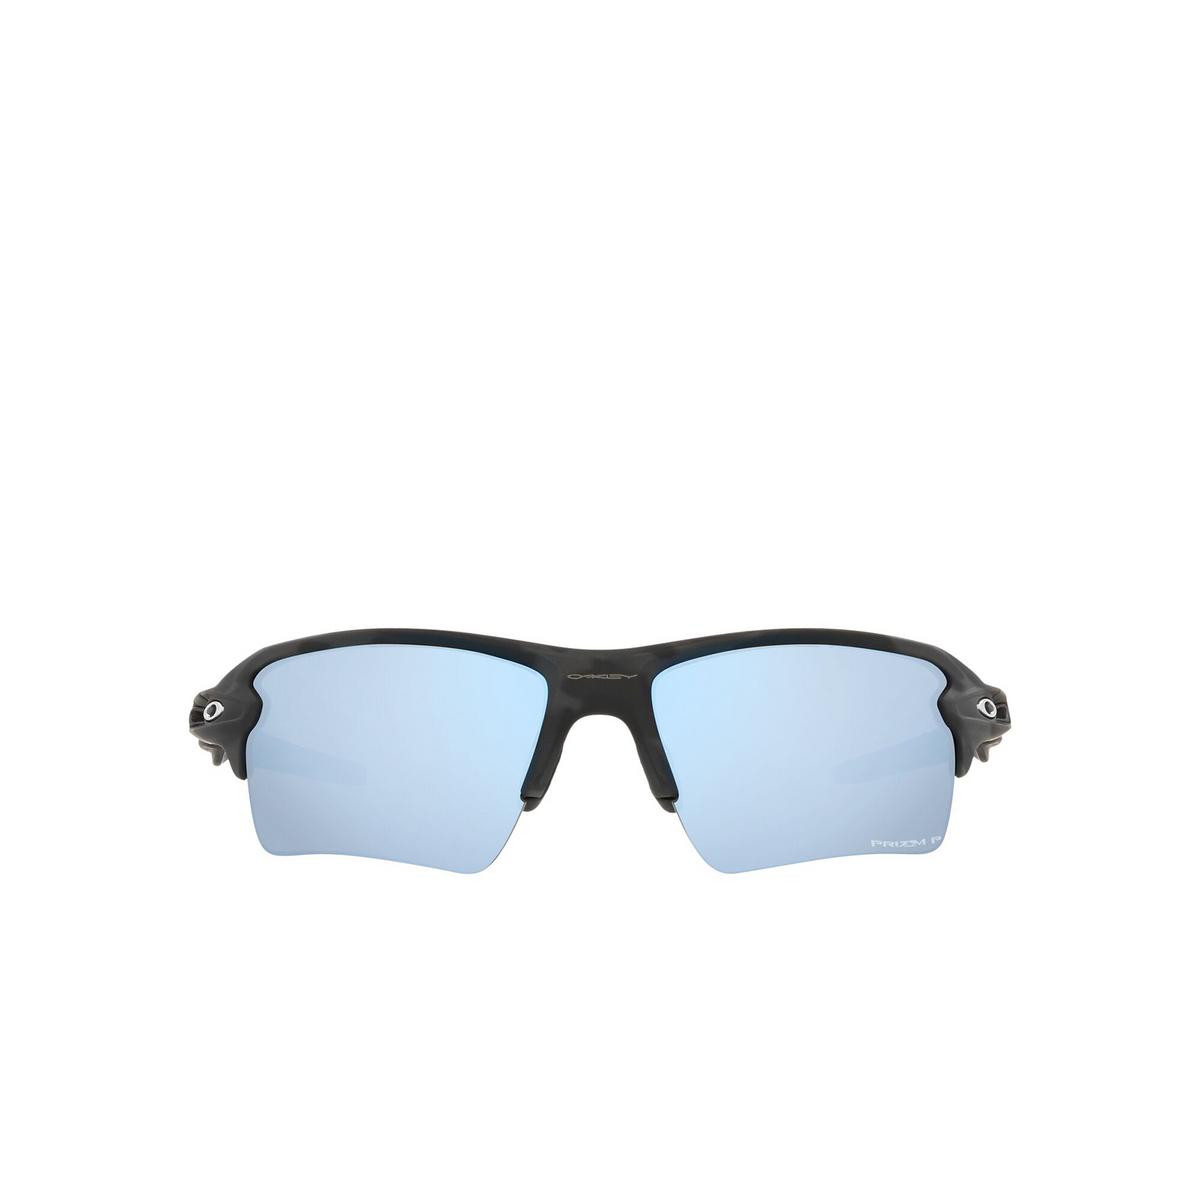 Oakley® Rectangle Sunglasses: Flak 2.0 Xl OO9188 color Matte Black Camo 9188G3 - front view.